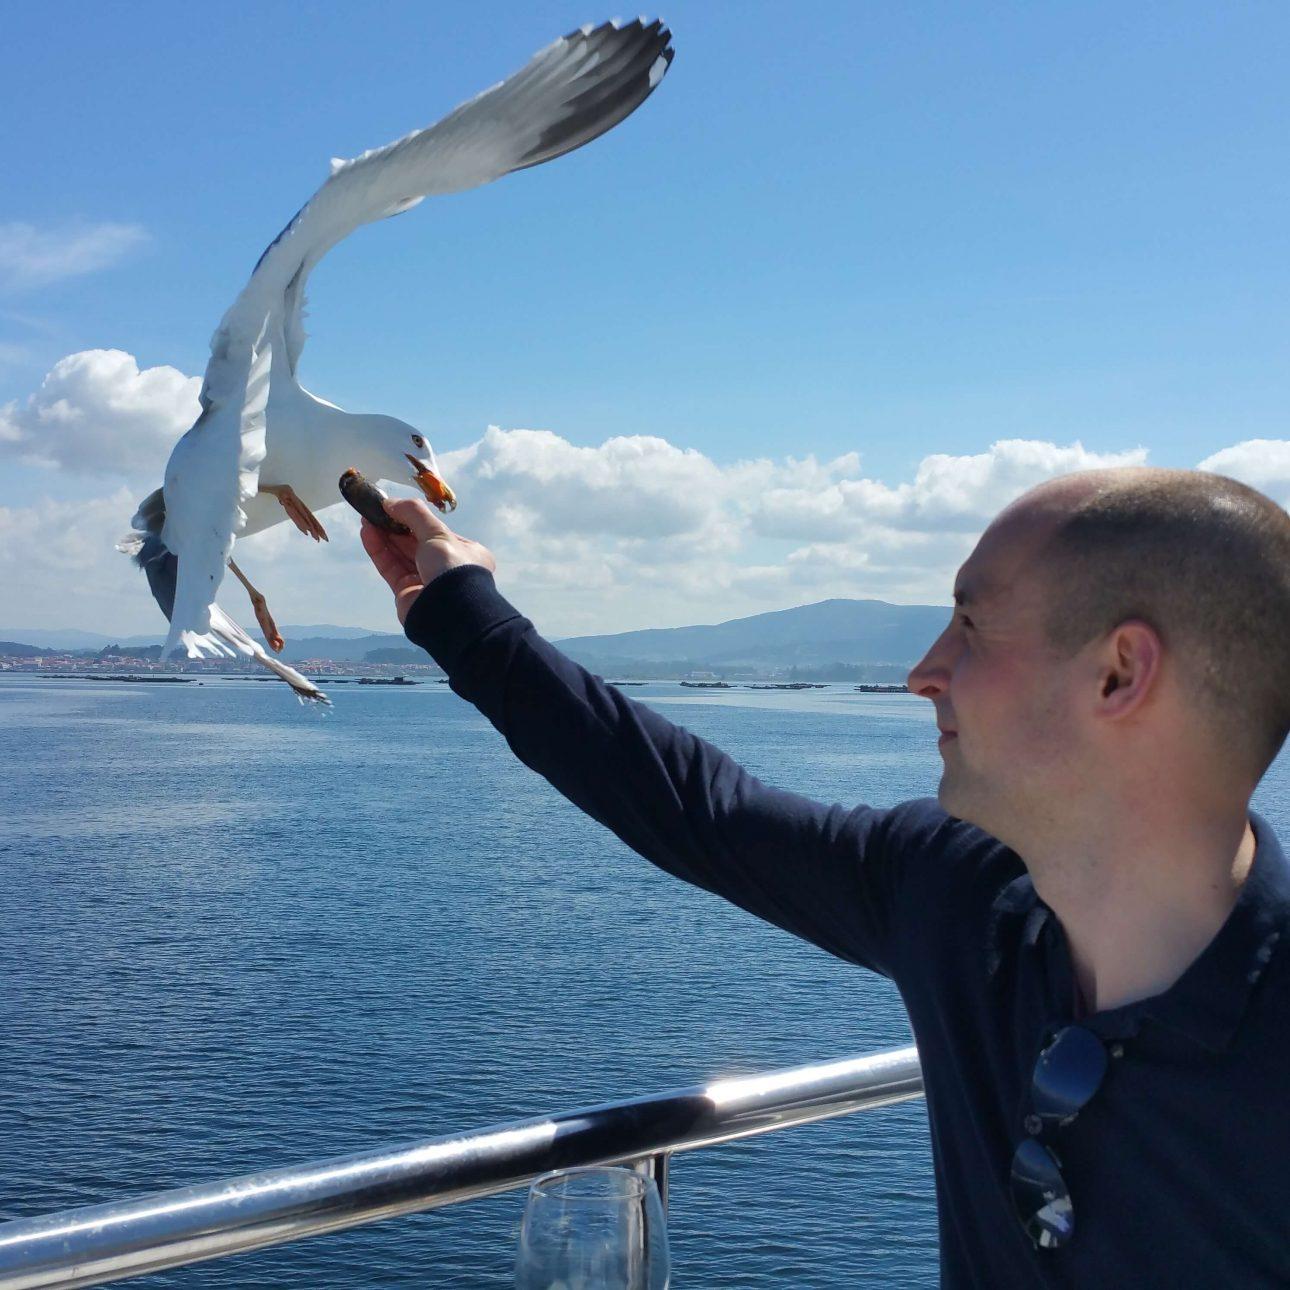 Funny moments with seagulls in the Catamaran through the Ria de Arousa